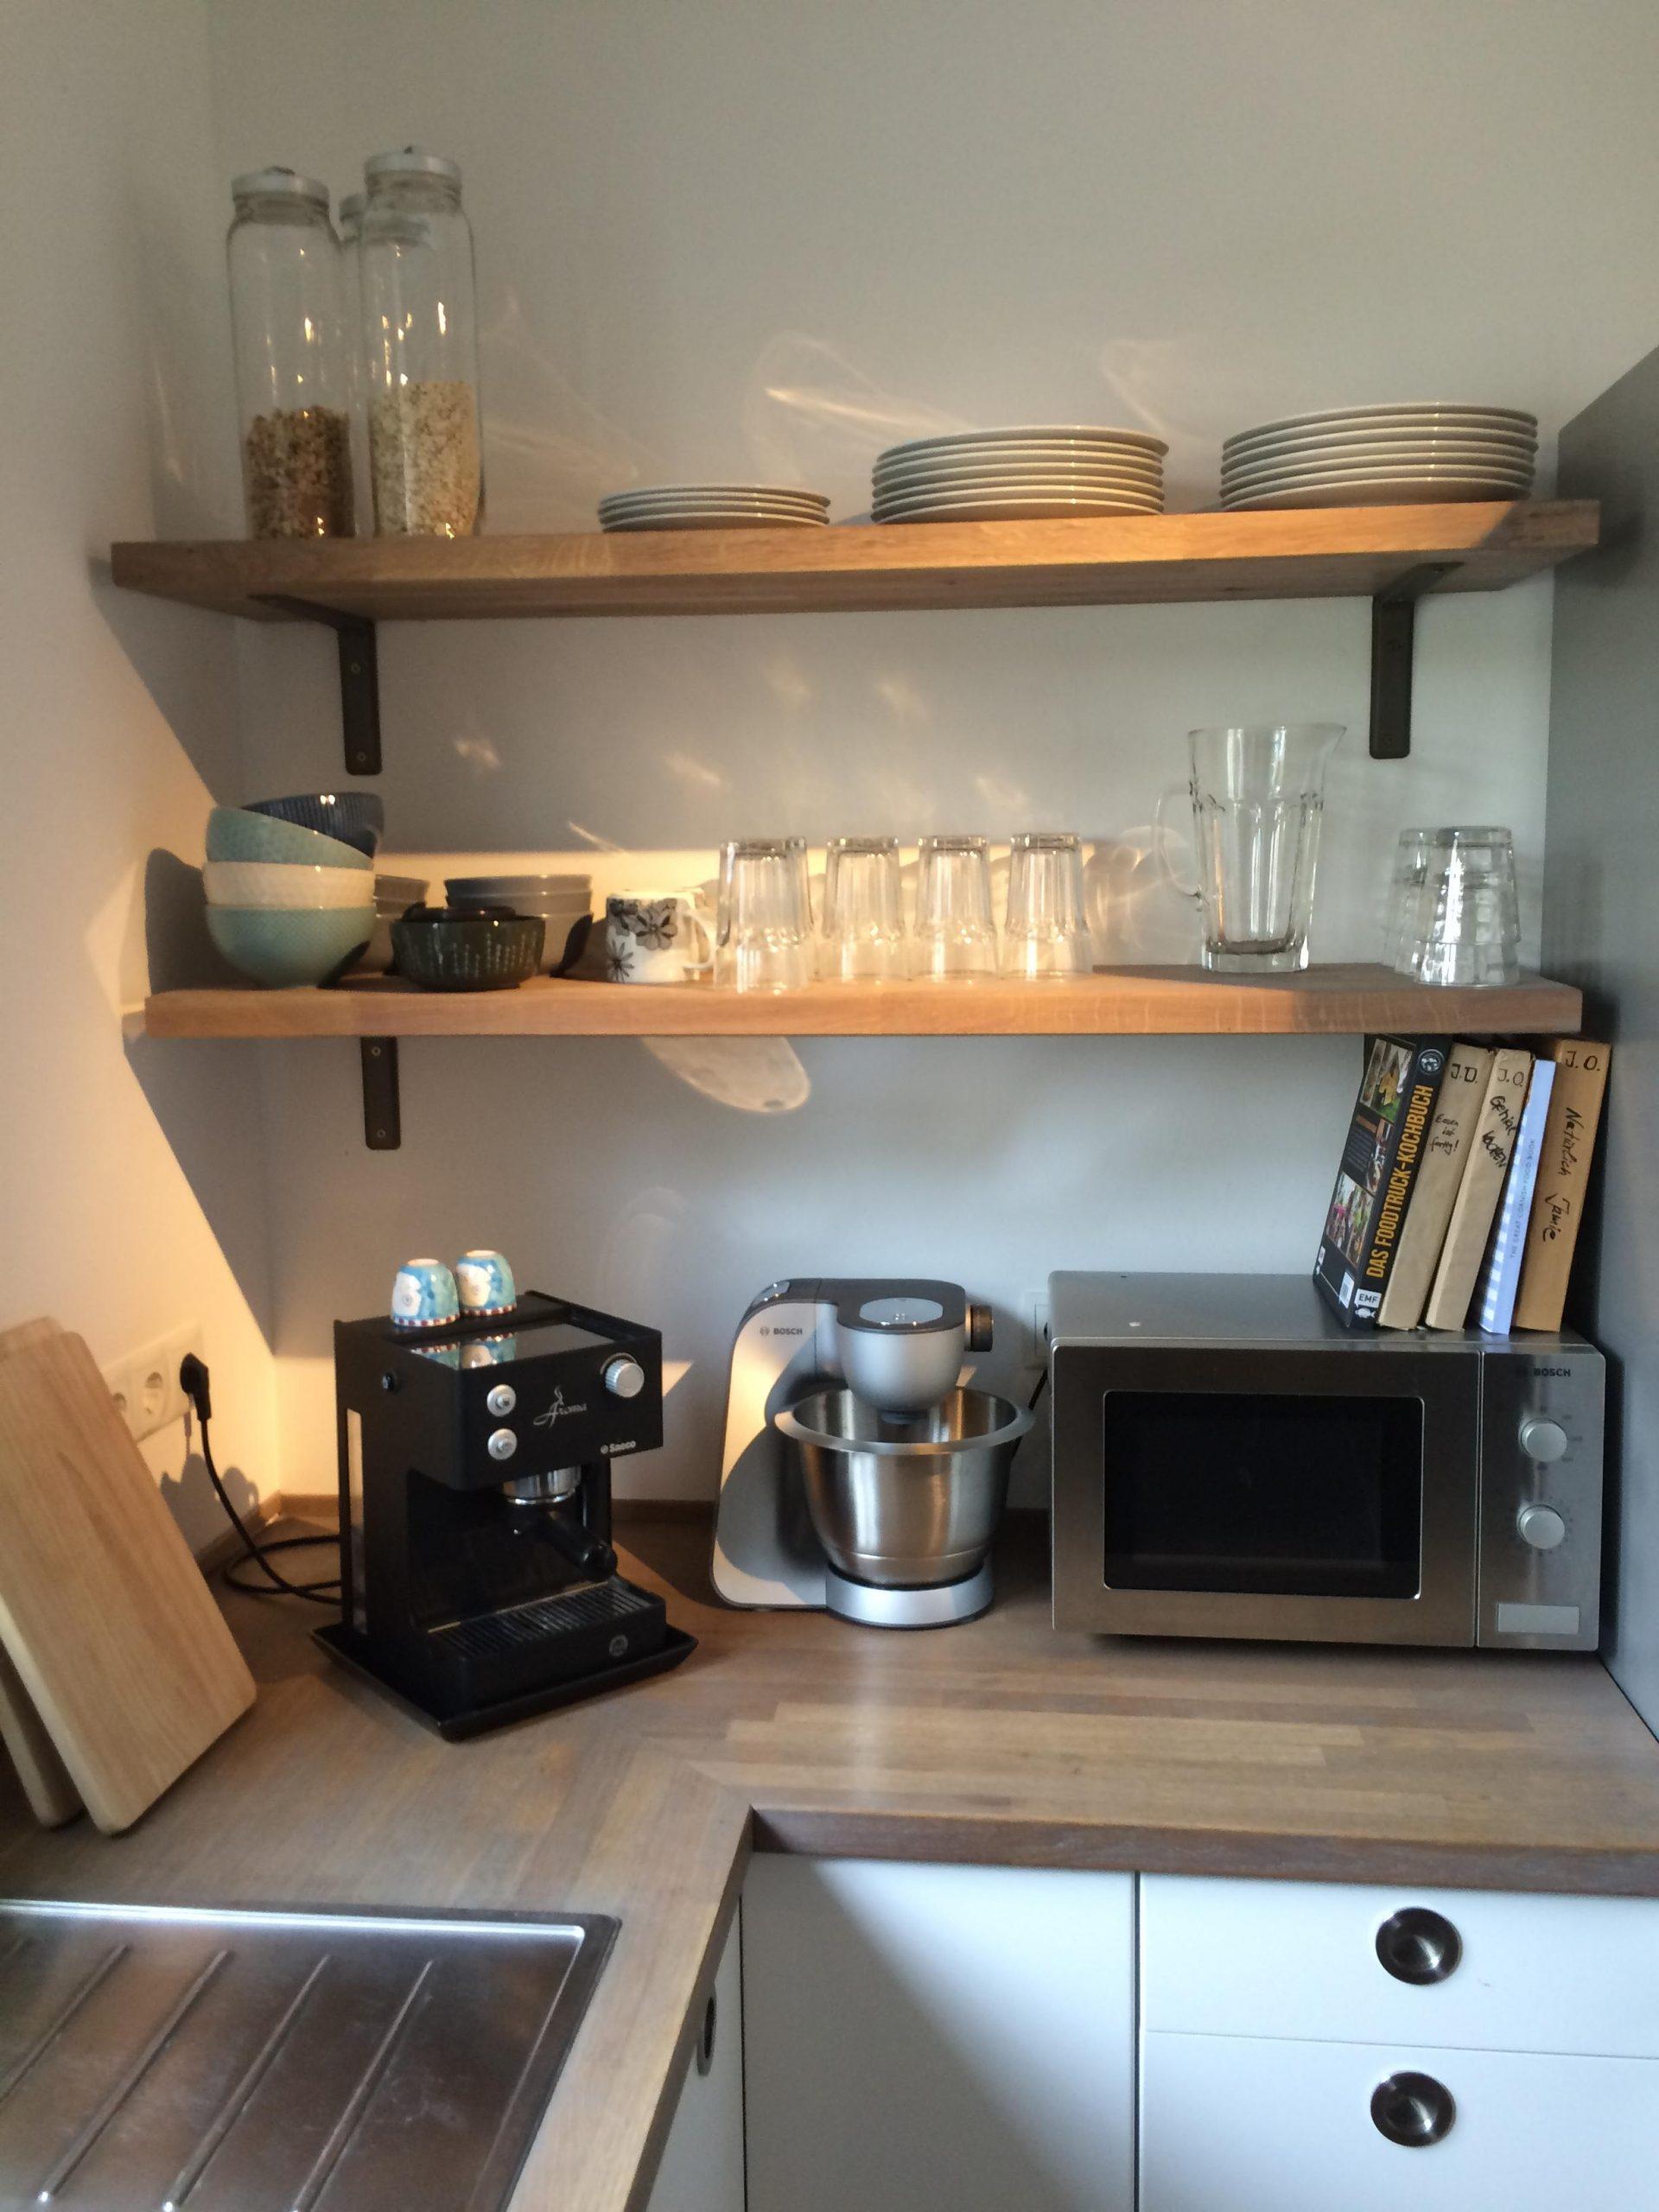 Full Size of Ikea Wandregal Küche Betonoptik L Mit Elektrogeräten Läufer Arbeitsplatte U Form Theke Holzregal Wandtattoo Tapete Modern Fliesenspiegel Sitzecke Günstig Wohnzimmer Ikea Wandregal Küche